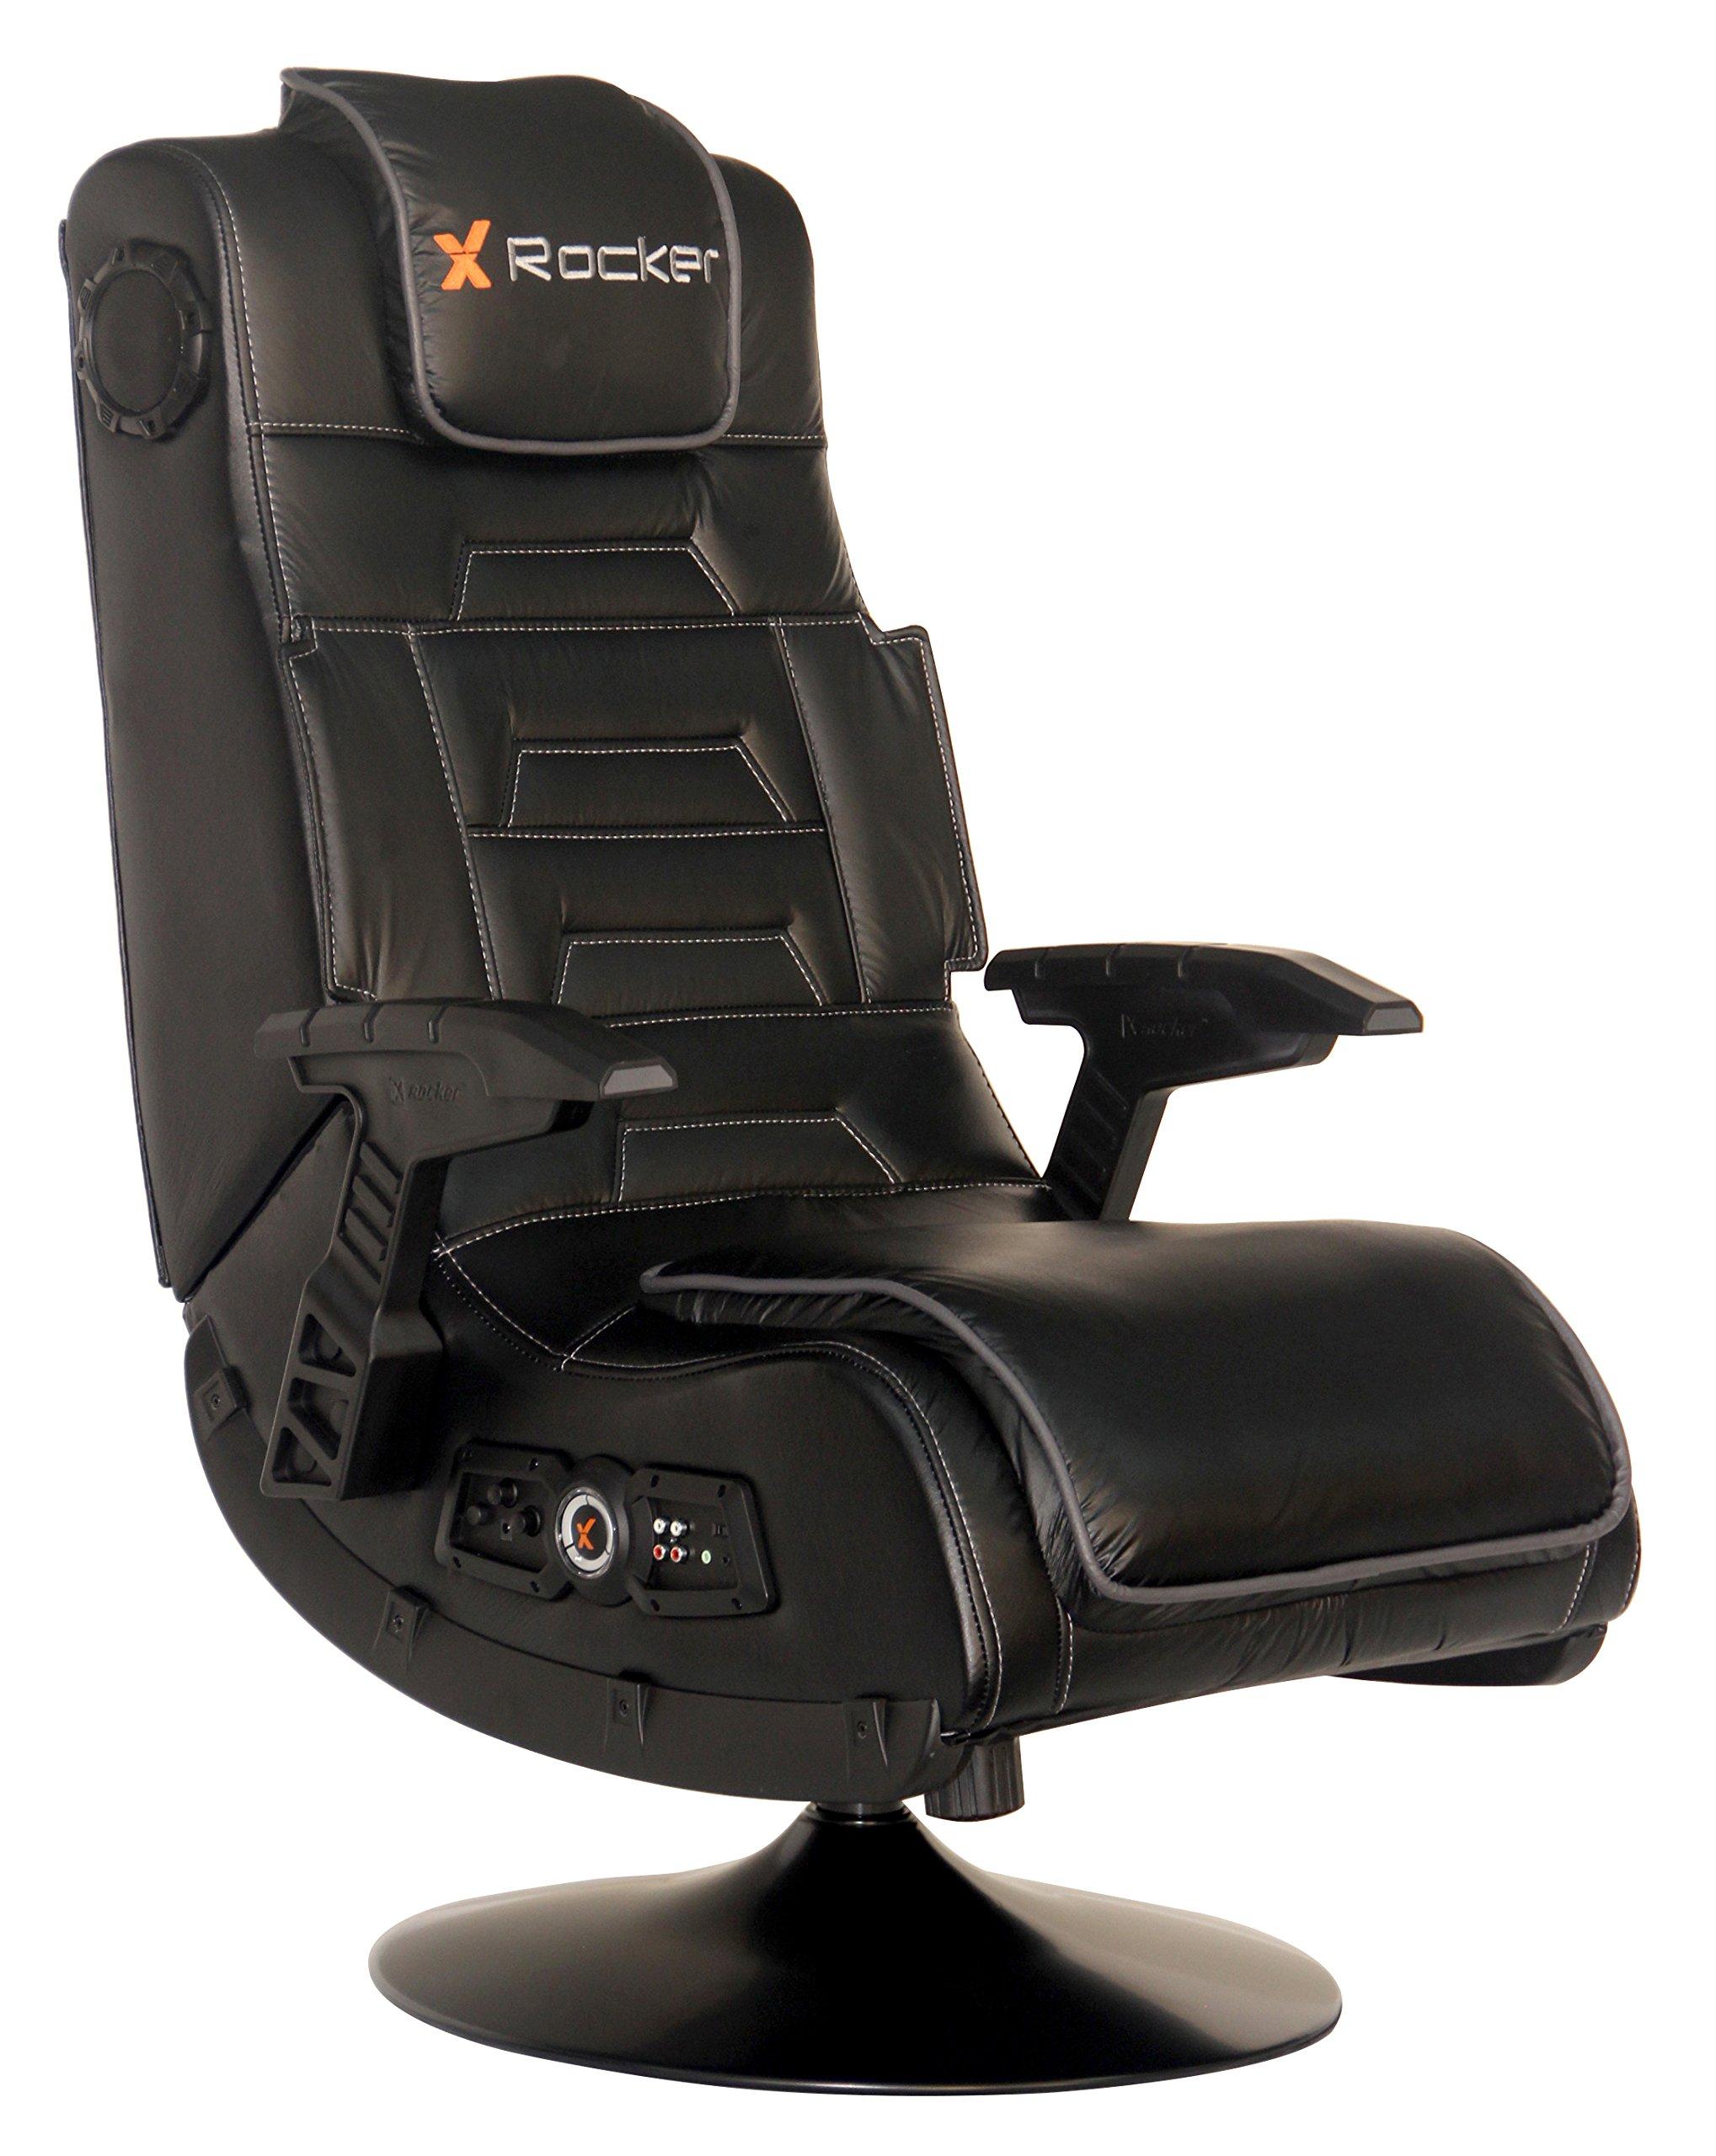 Rocker 51396 Pedestal Gaming Wireless